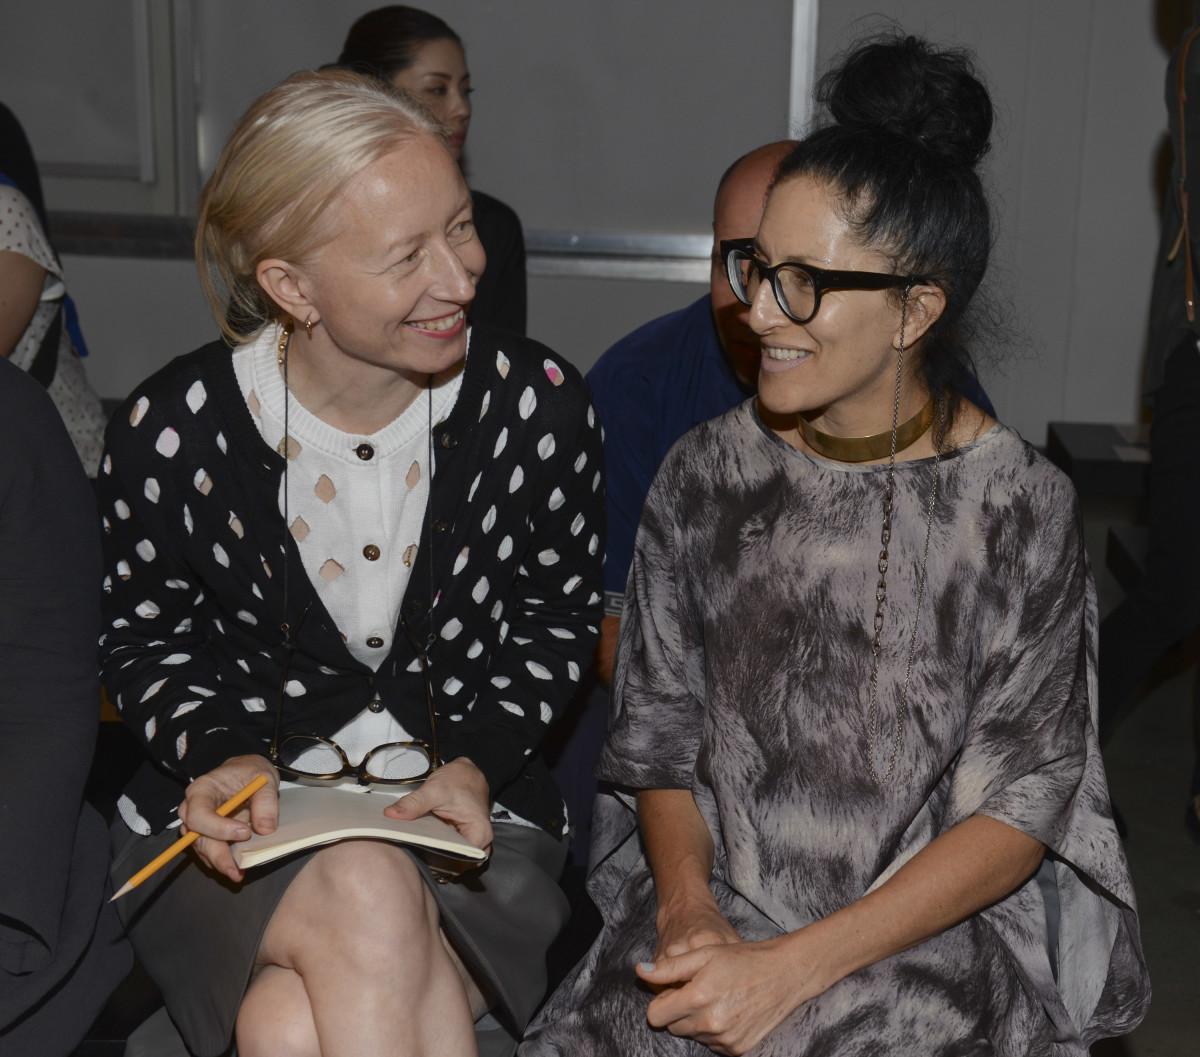 Kowalska with stylist Haidee Findlay-Levin. Photo: Vivien Killilea/Getty Images